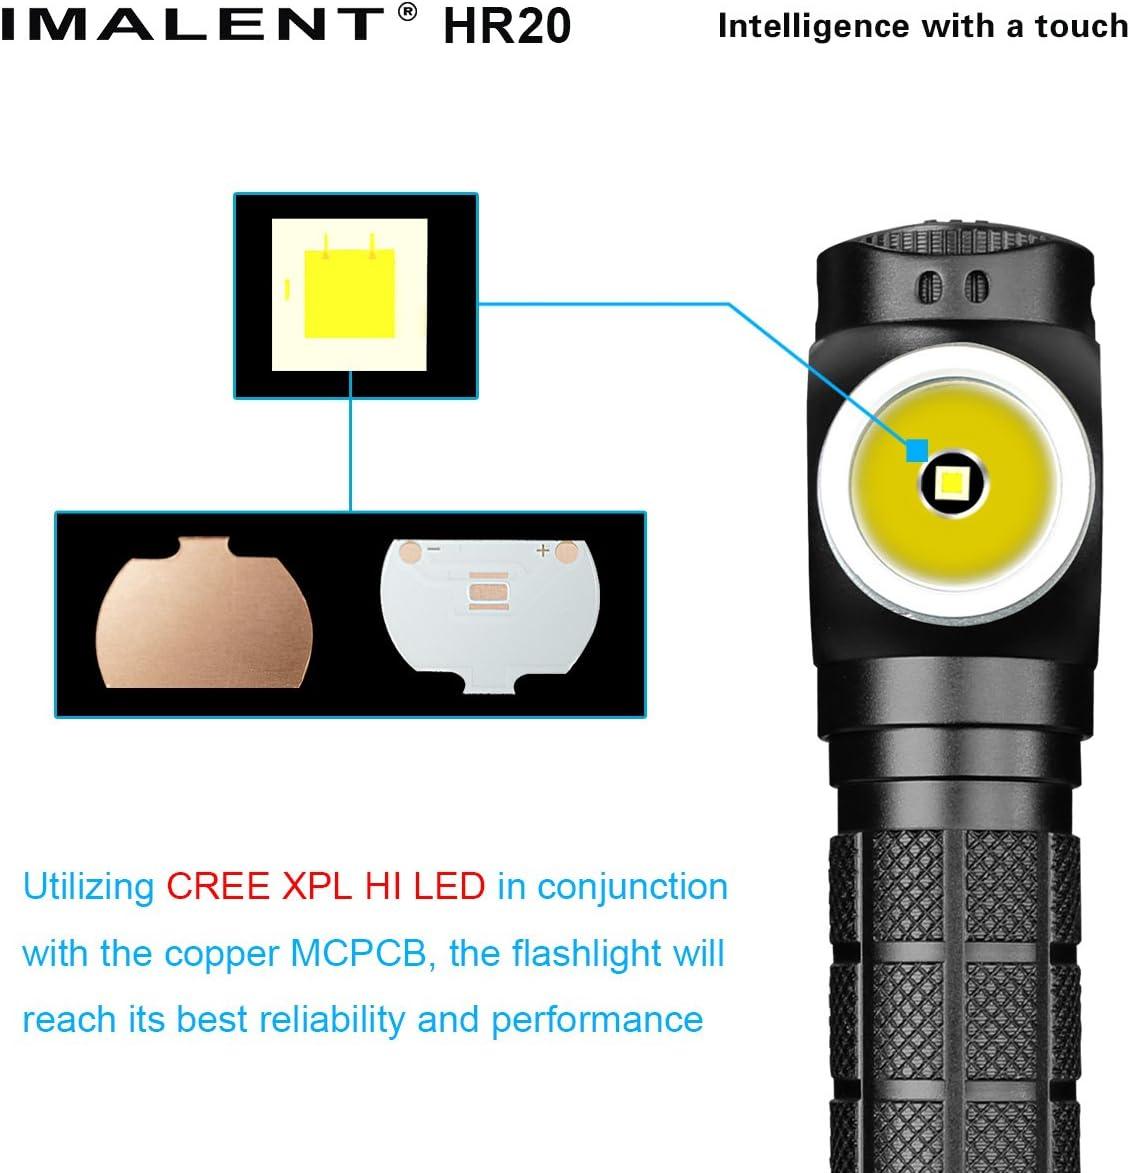 Imalent HR20 Cree XPL HI LED USB Rechargeable Headlamp Flashlight Torch